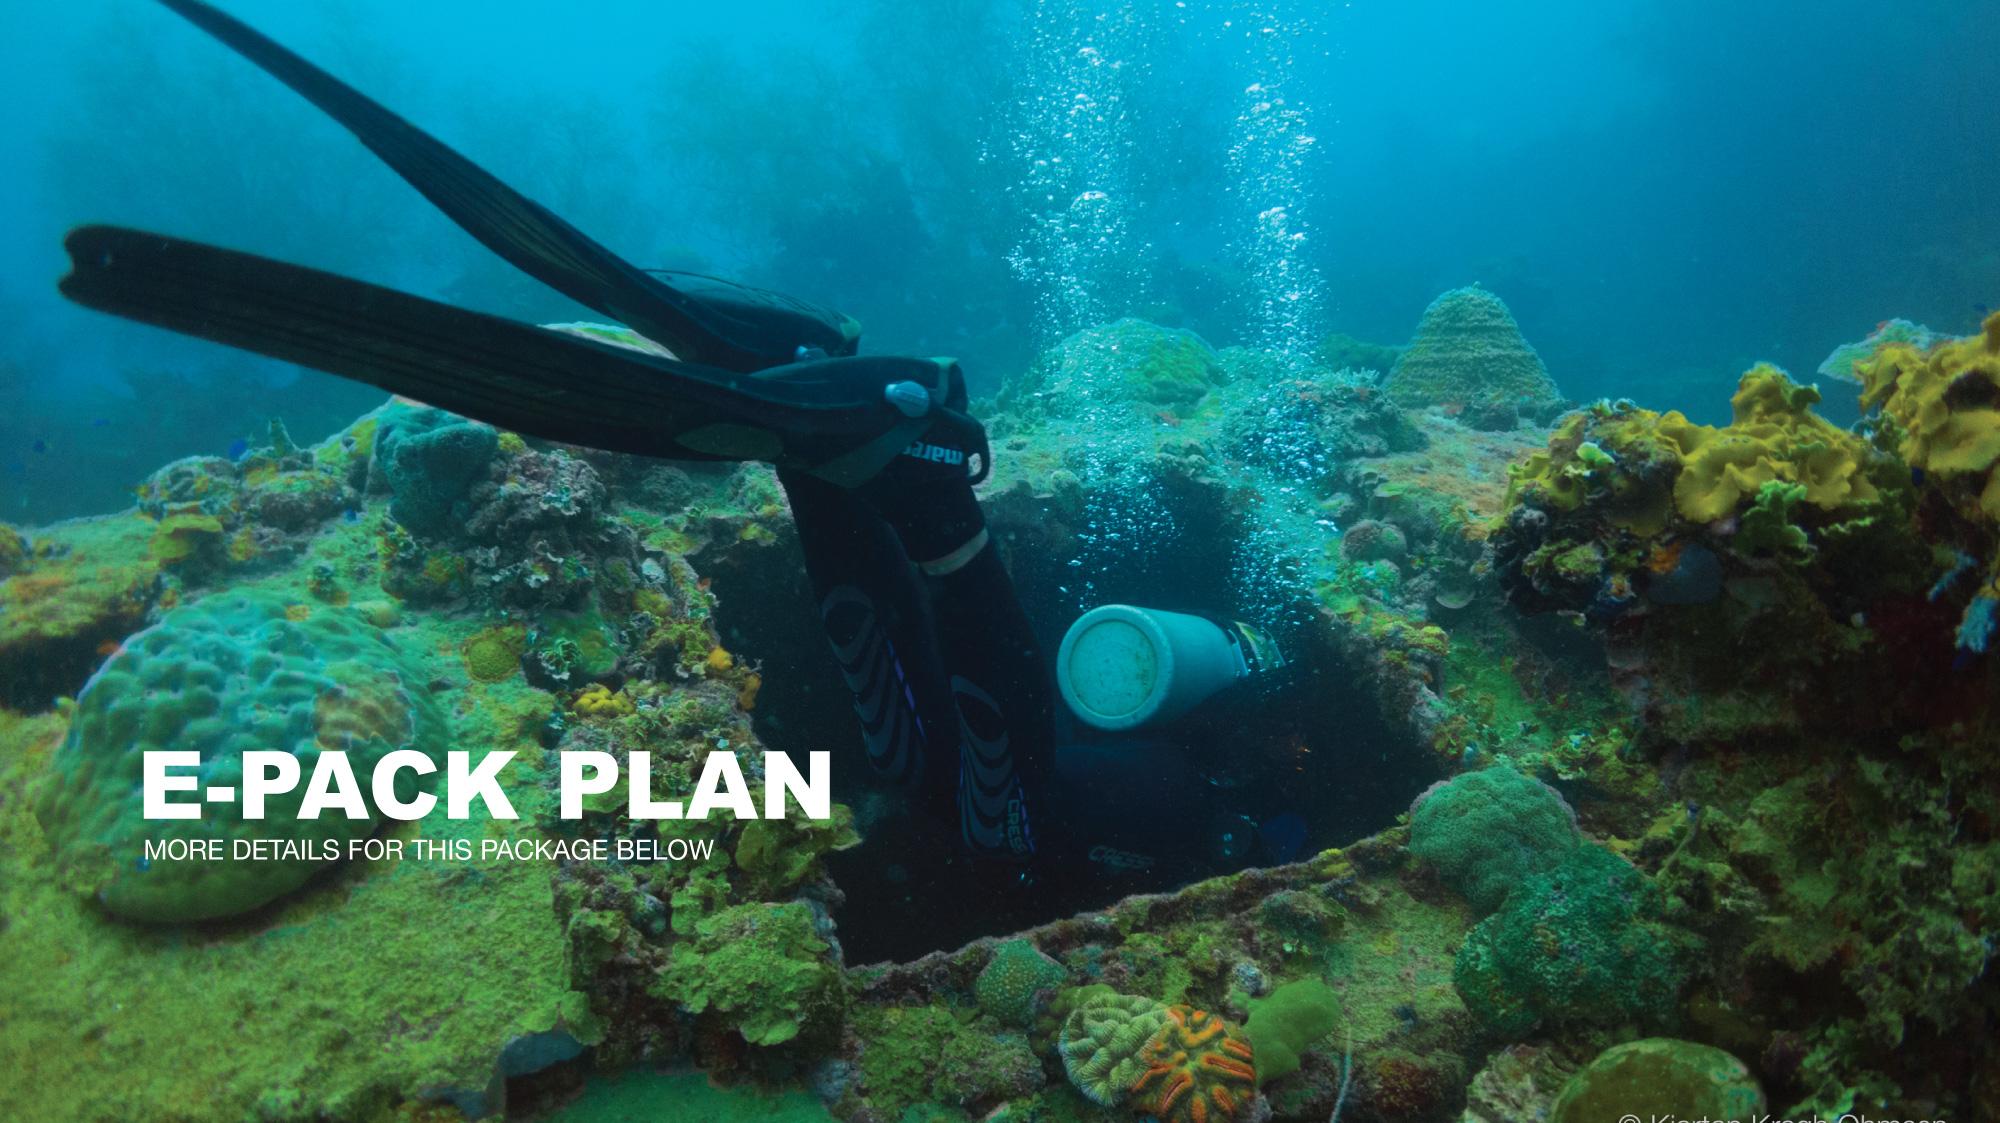 Ss thorfinn liveaboard diving the truk lagoon micronesia altavistaventures Gallery